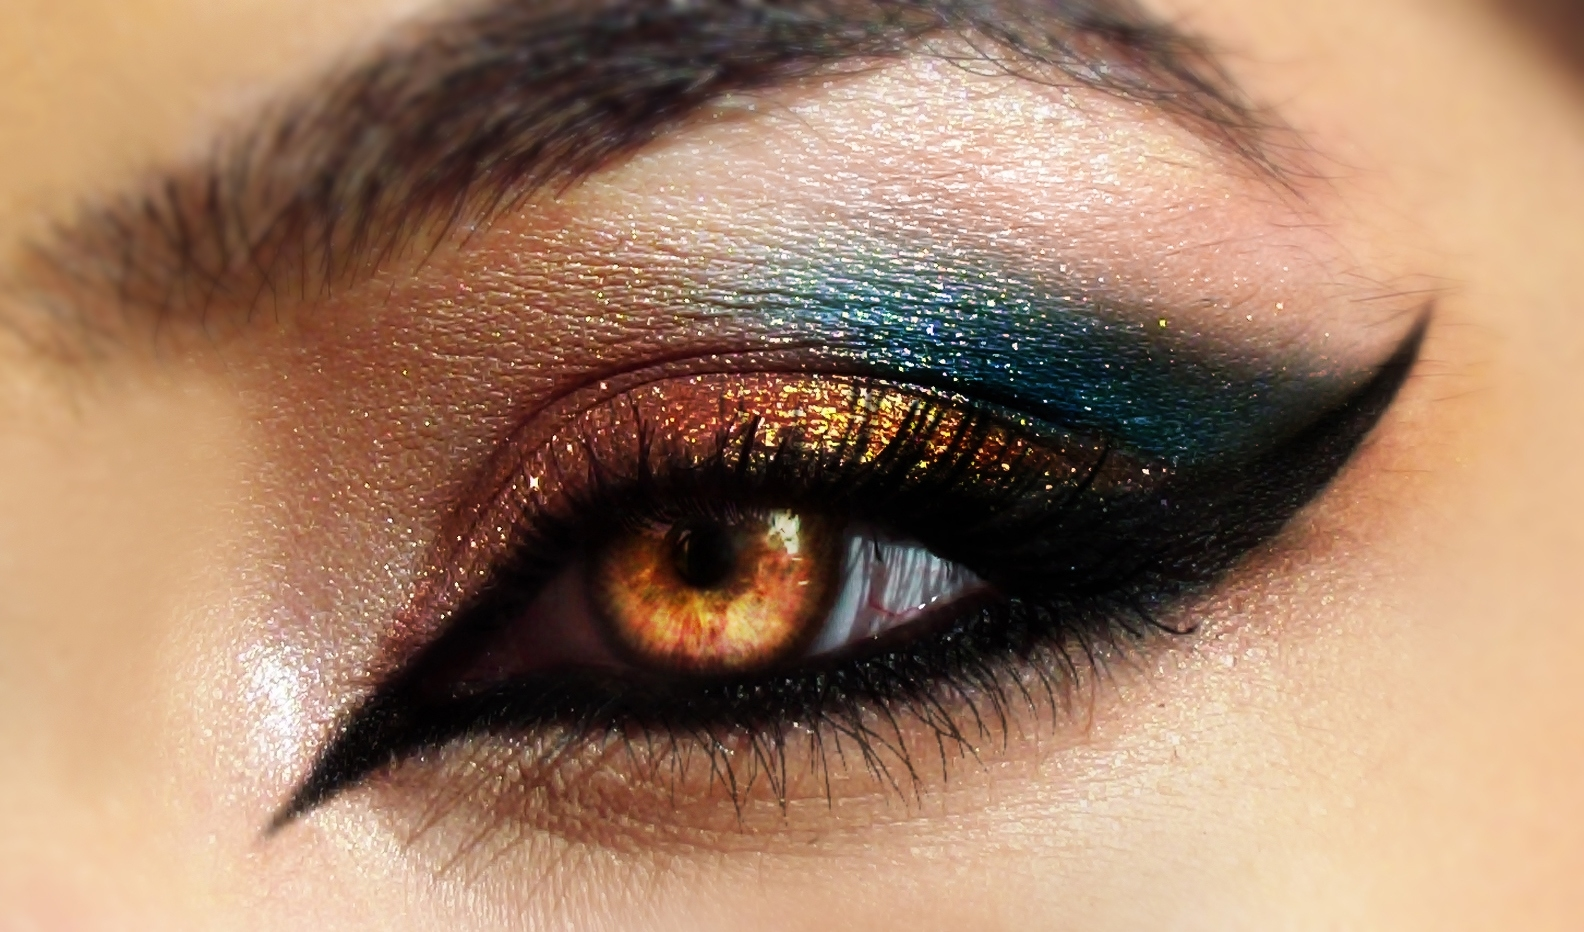 Makeup Pictures And Makeup Photos Free Download Blog: Amazing Eye throughout Eye Makeup Pic Free Download